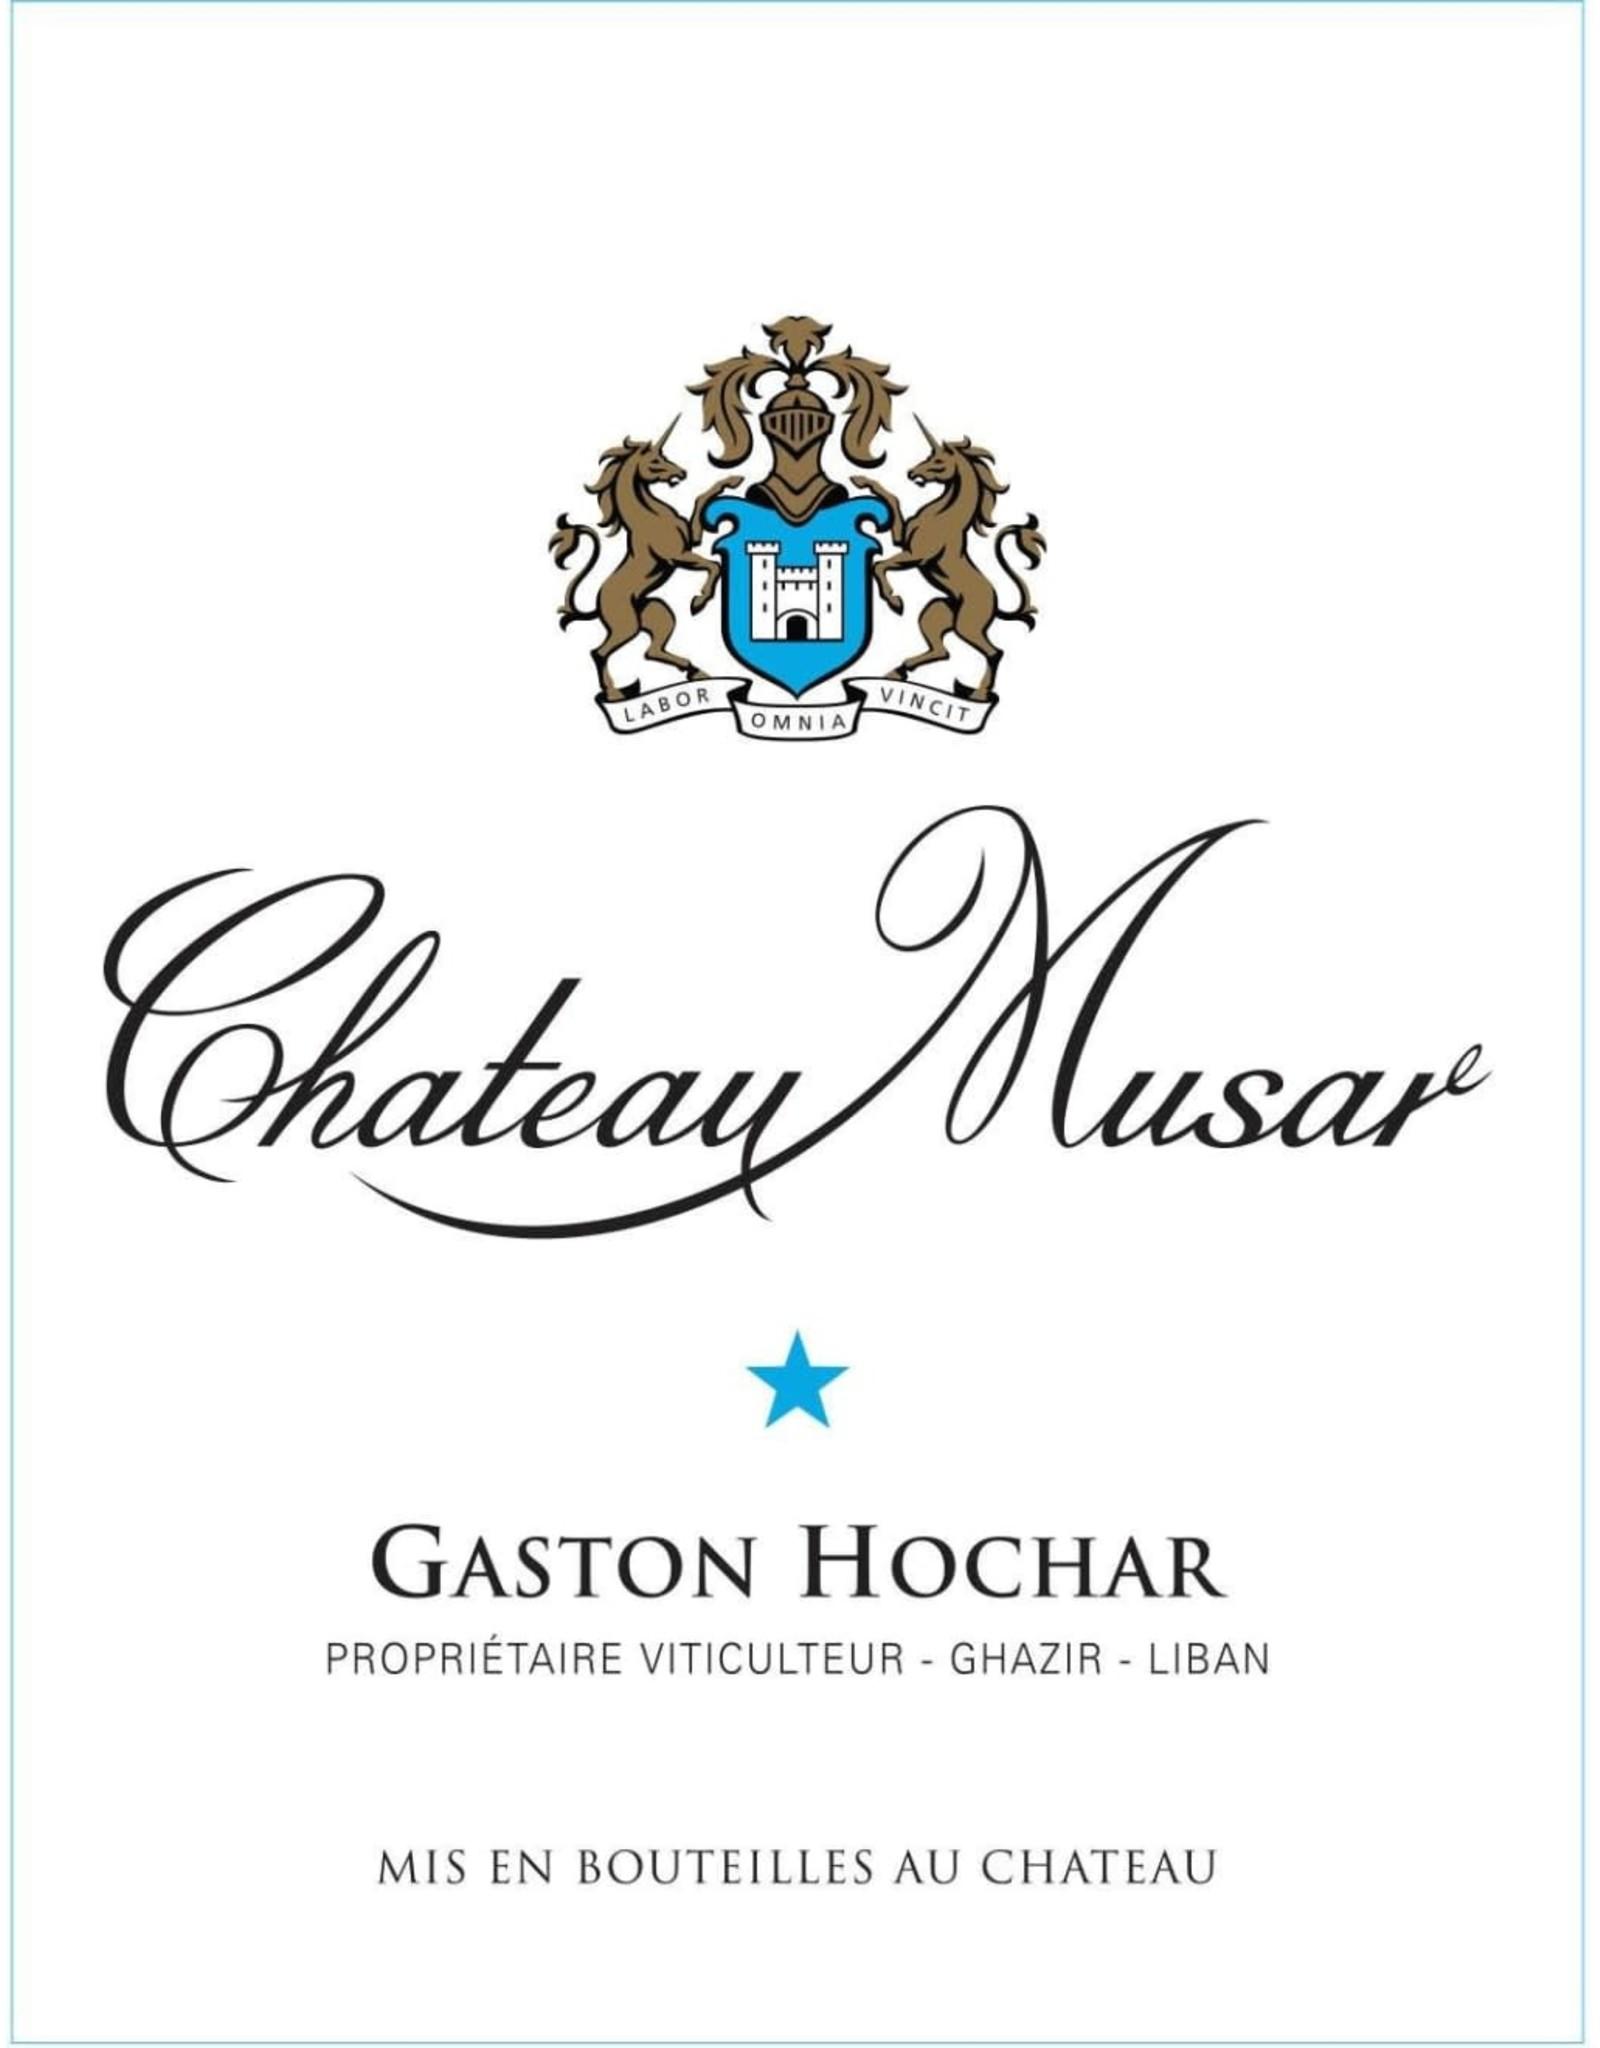 Chateau Musar Chateau Musar Blanc, Beska Valley, Lebanon 2012